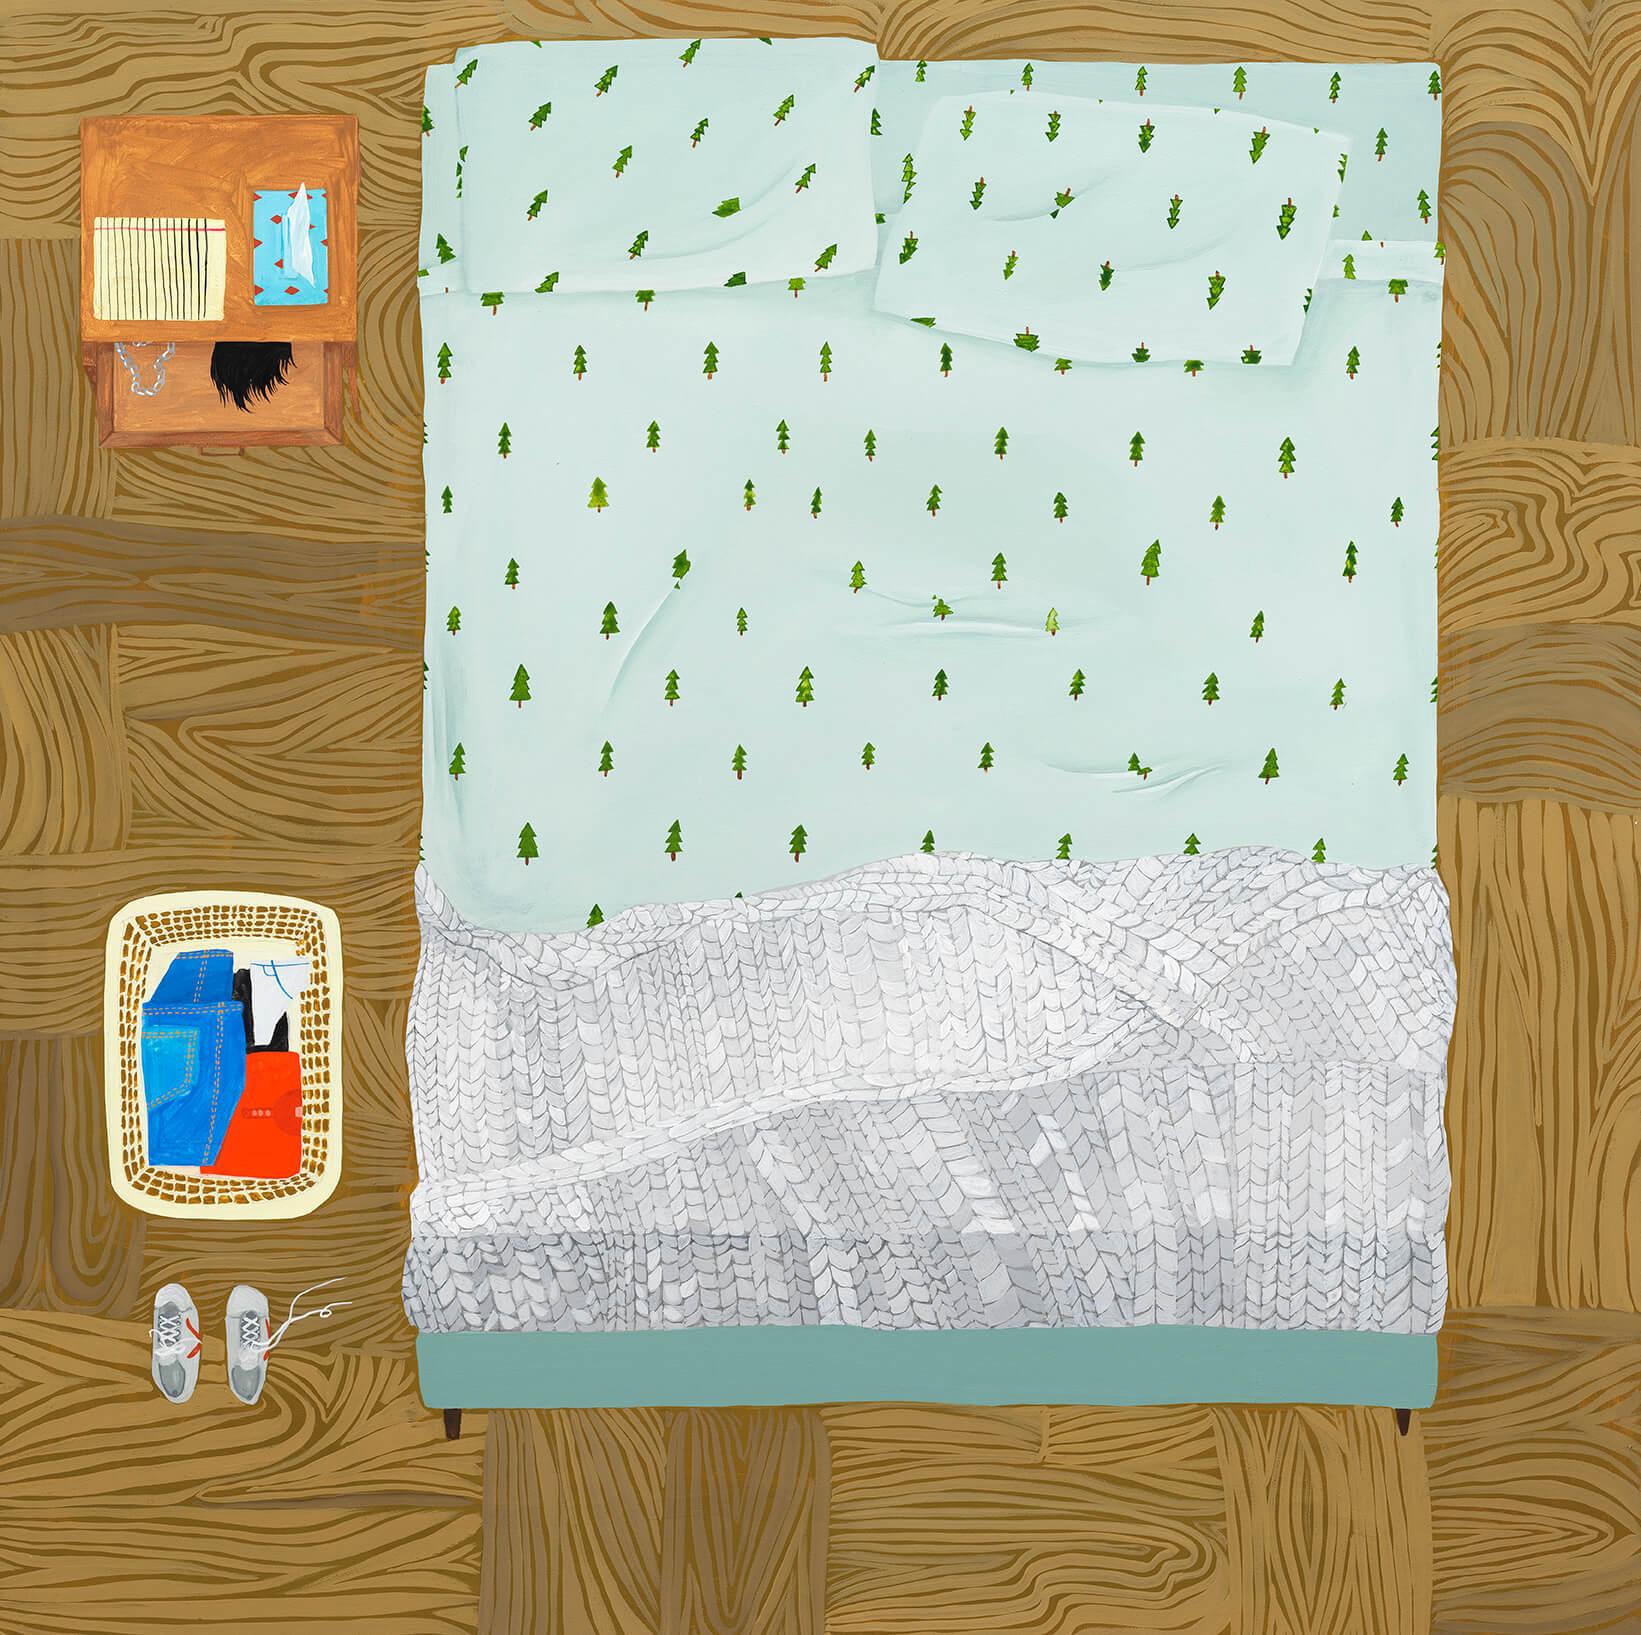 Anne Buckwalter Evergreens, 2019 gouache on panel 24 x 24 in. (61 x 61 cm.)